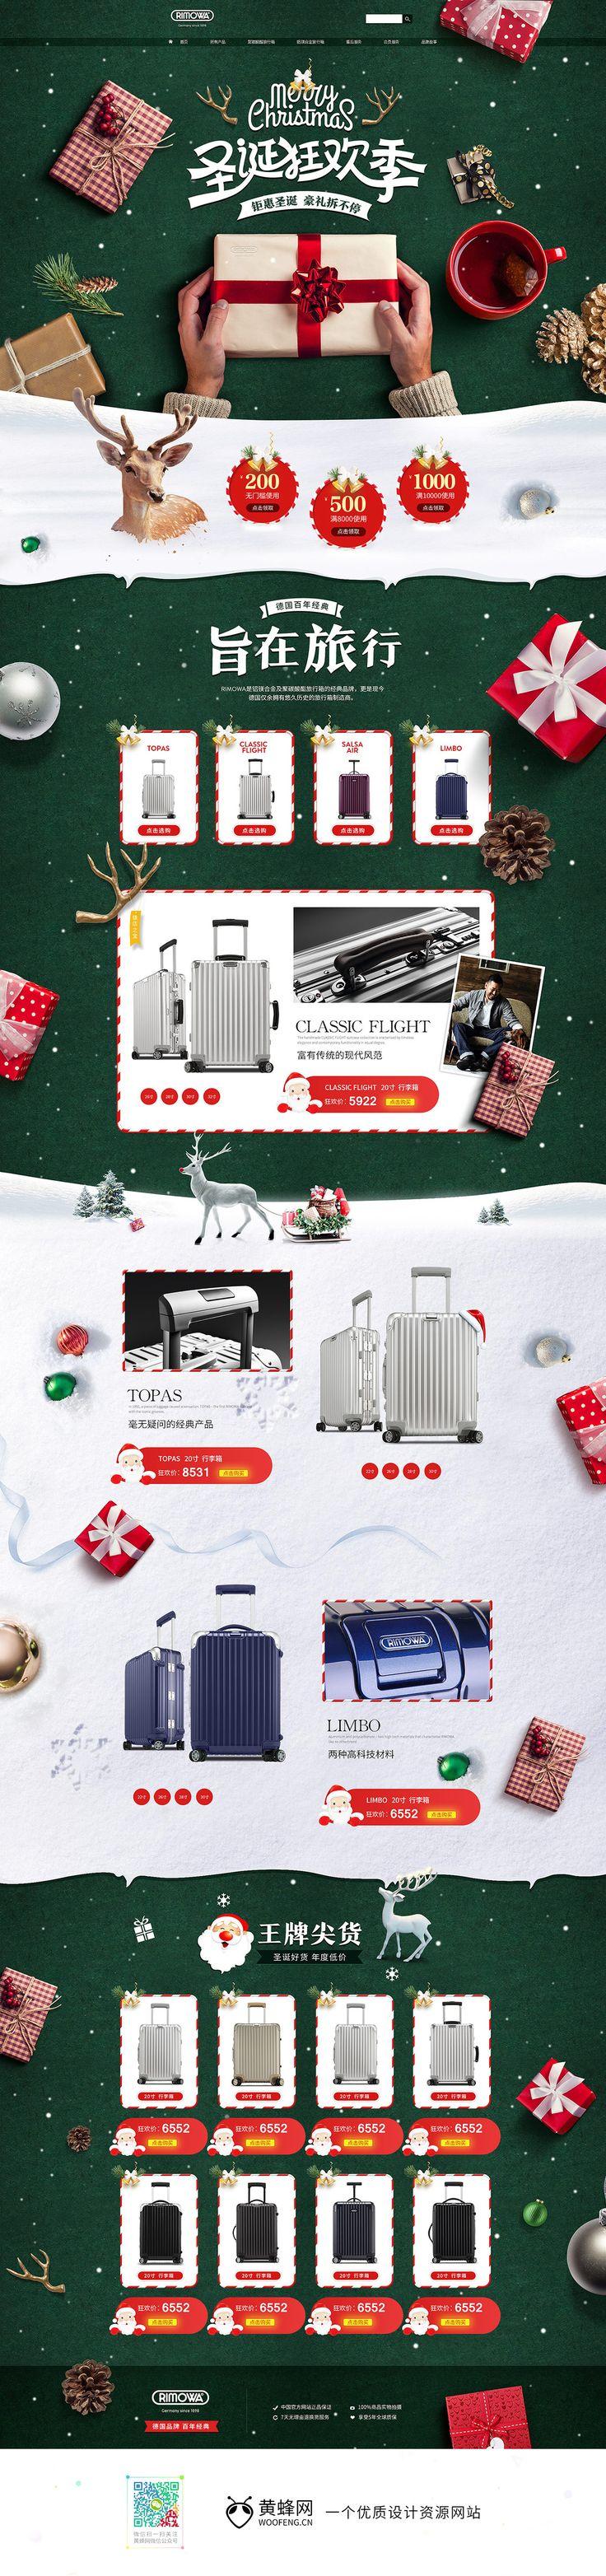 rimowa箱包圣诞节天猫首页活动专题页面设计 来源自黄蜂网http://woofeng.cn/